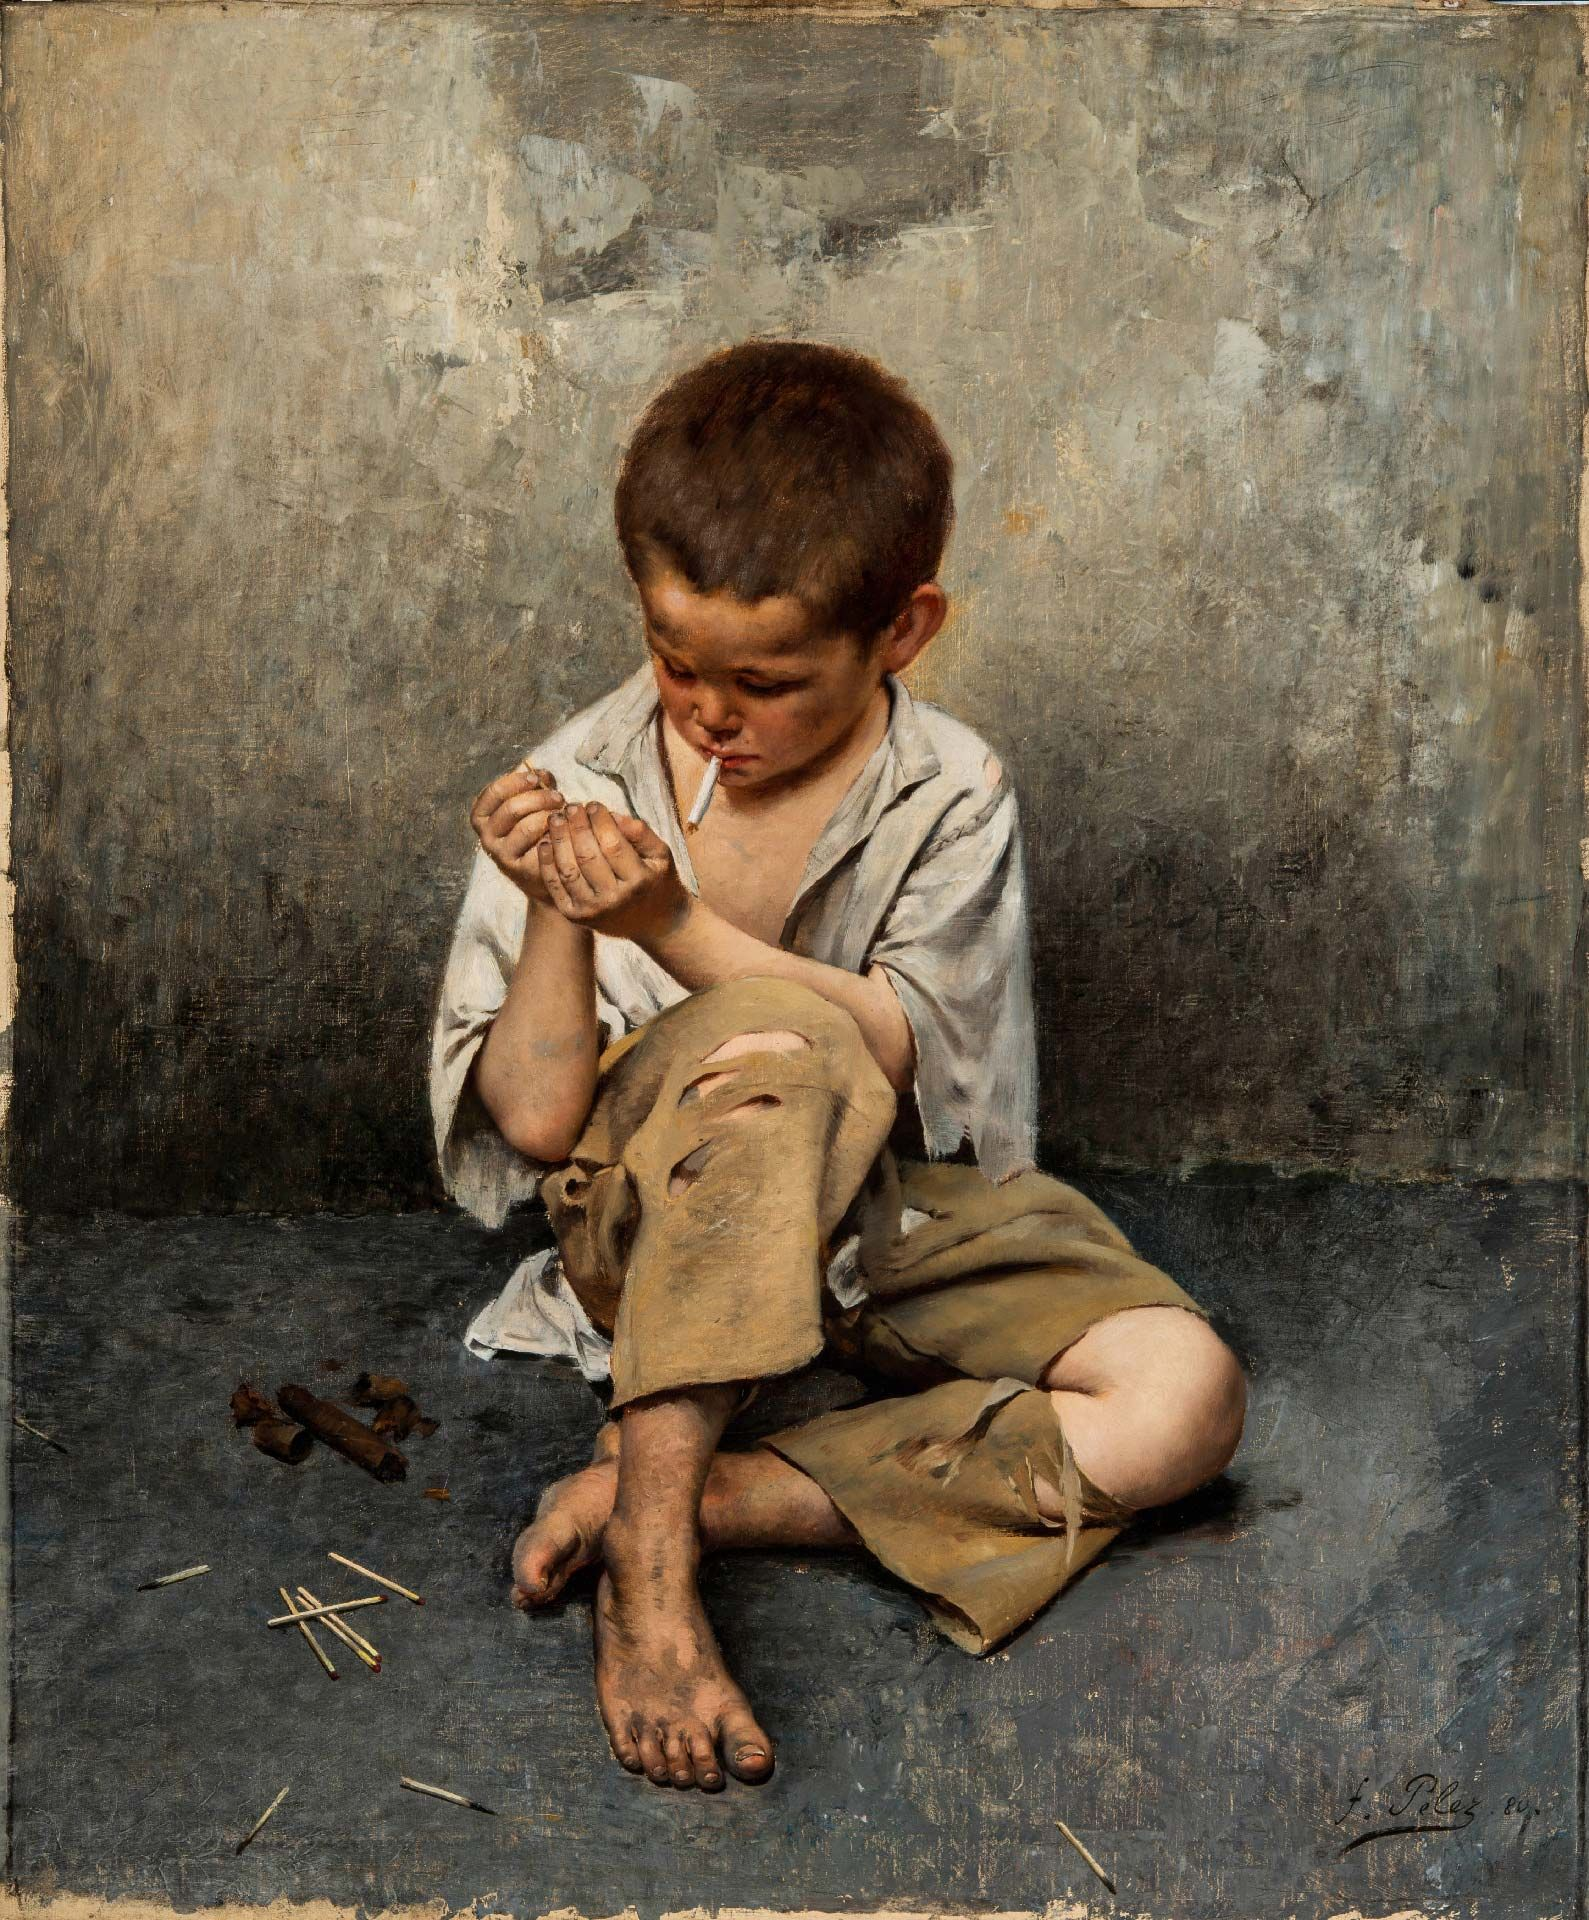 Fernand Pelez, Street Child, 1880, oil on canvas, 95.3 x 79.1 cm. MMFA, William F. Angus Bequest